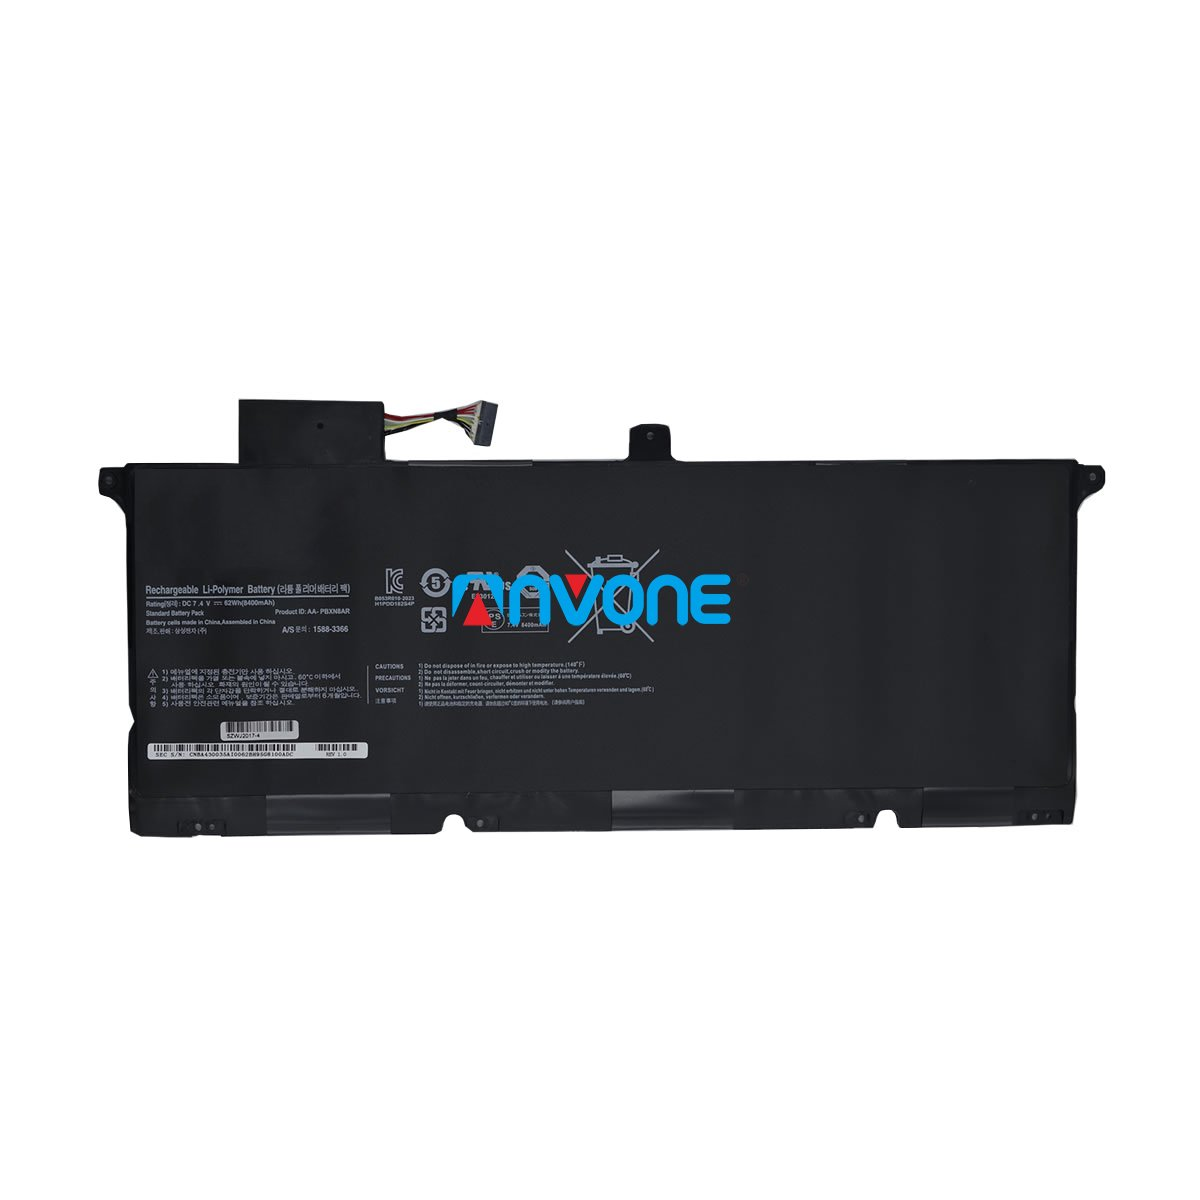 Samsung AA-PBXN8AR Battery Samsung 900X4B-A01FR 900X4B-A02 Battery